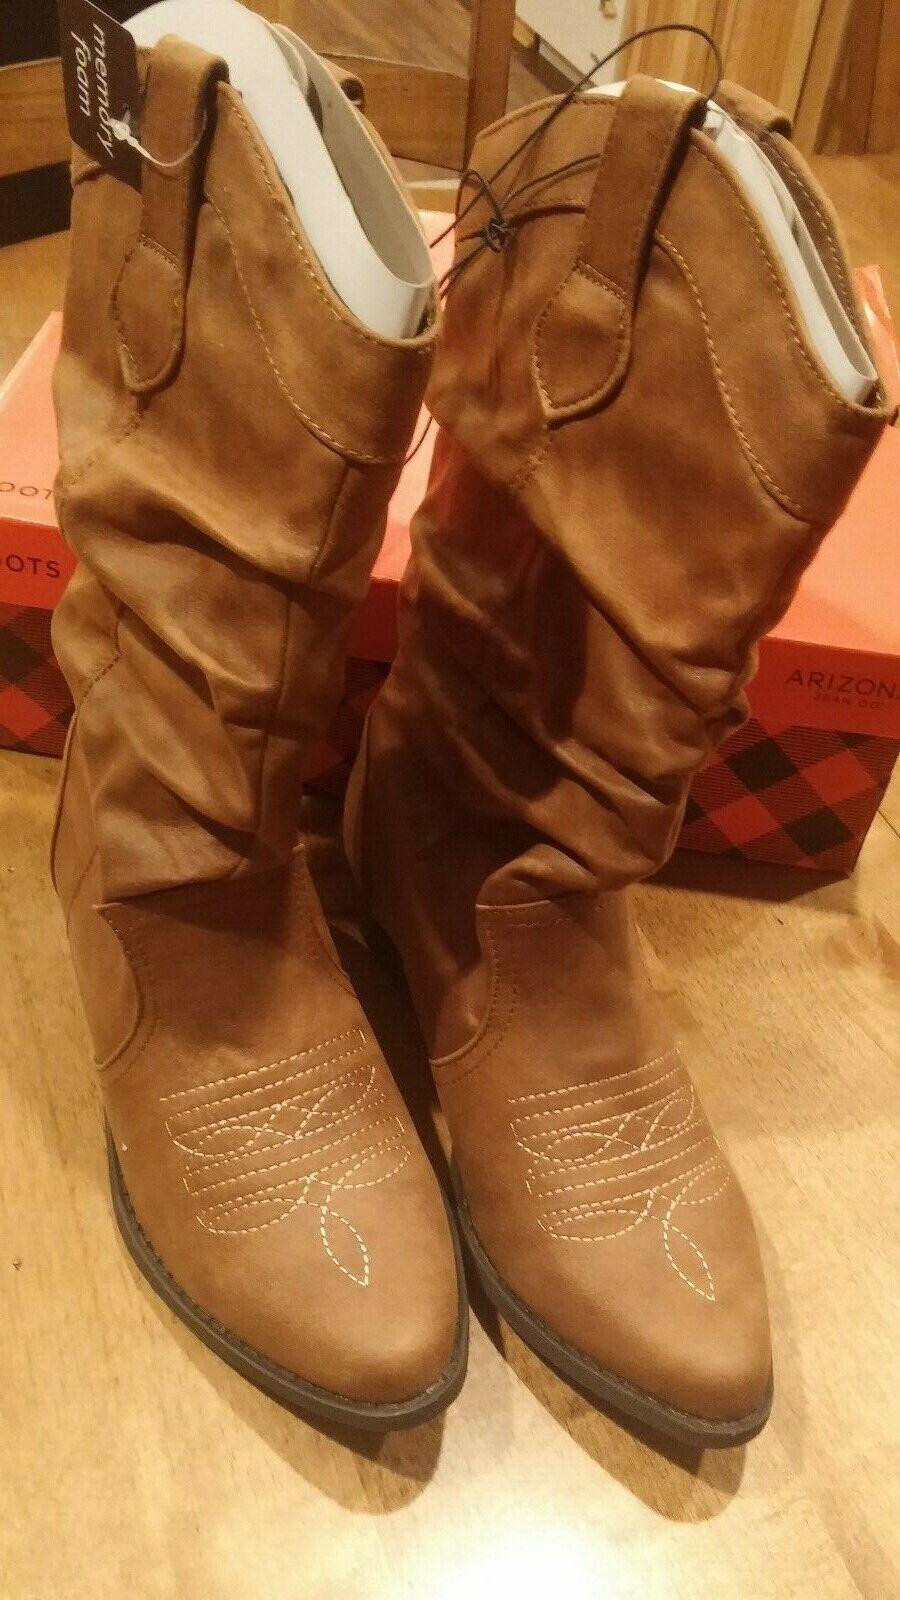 NEW W TAGS & Original Box Arizona Slouch Boot DK BROWN 6 MEDIUM MEMORY FOAM